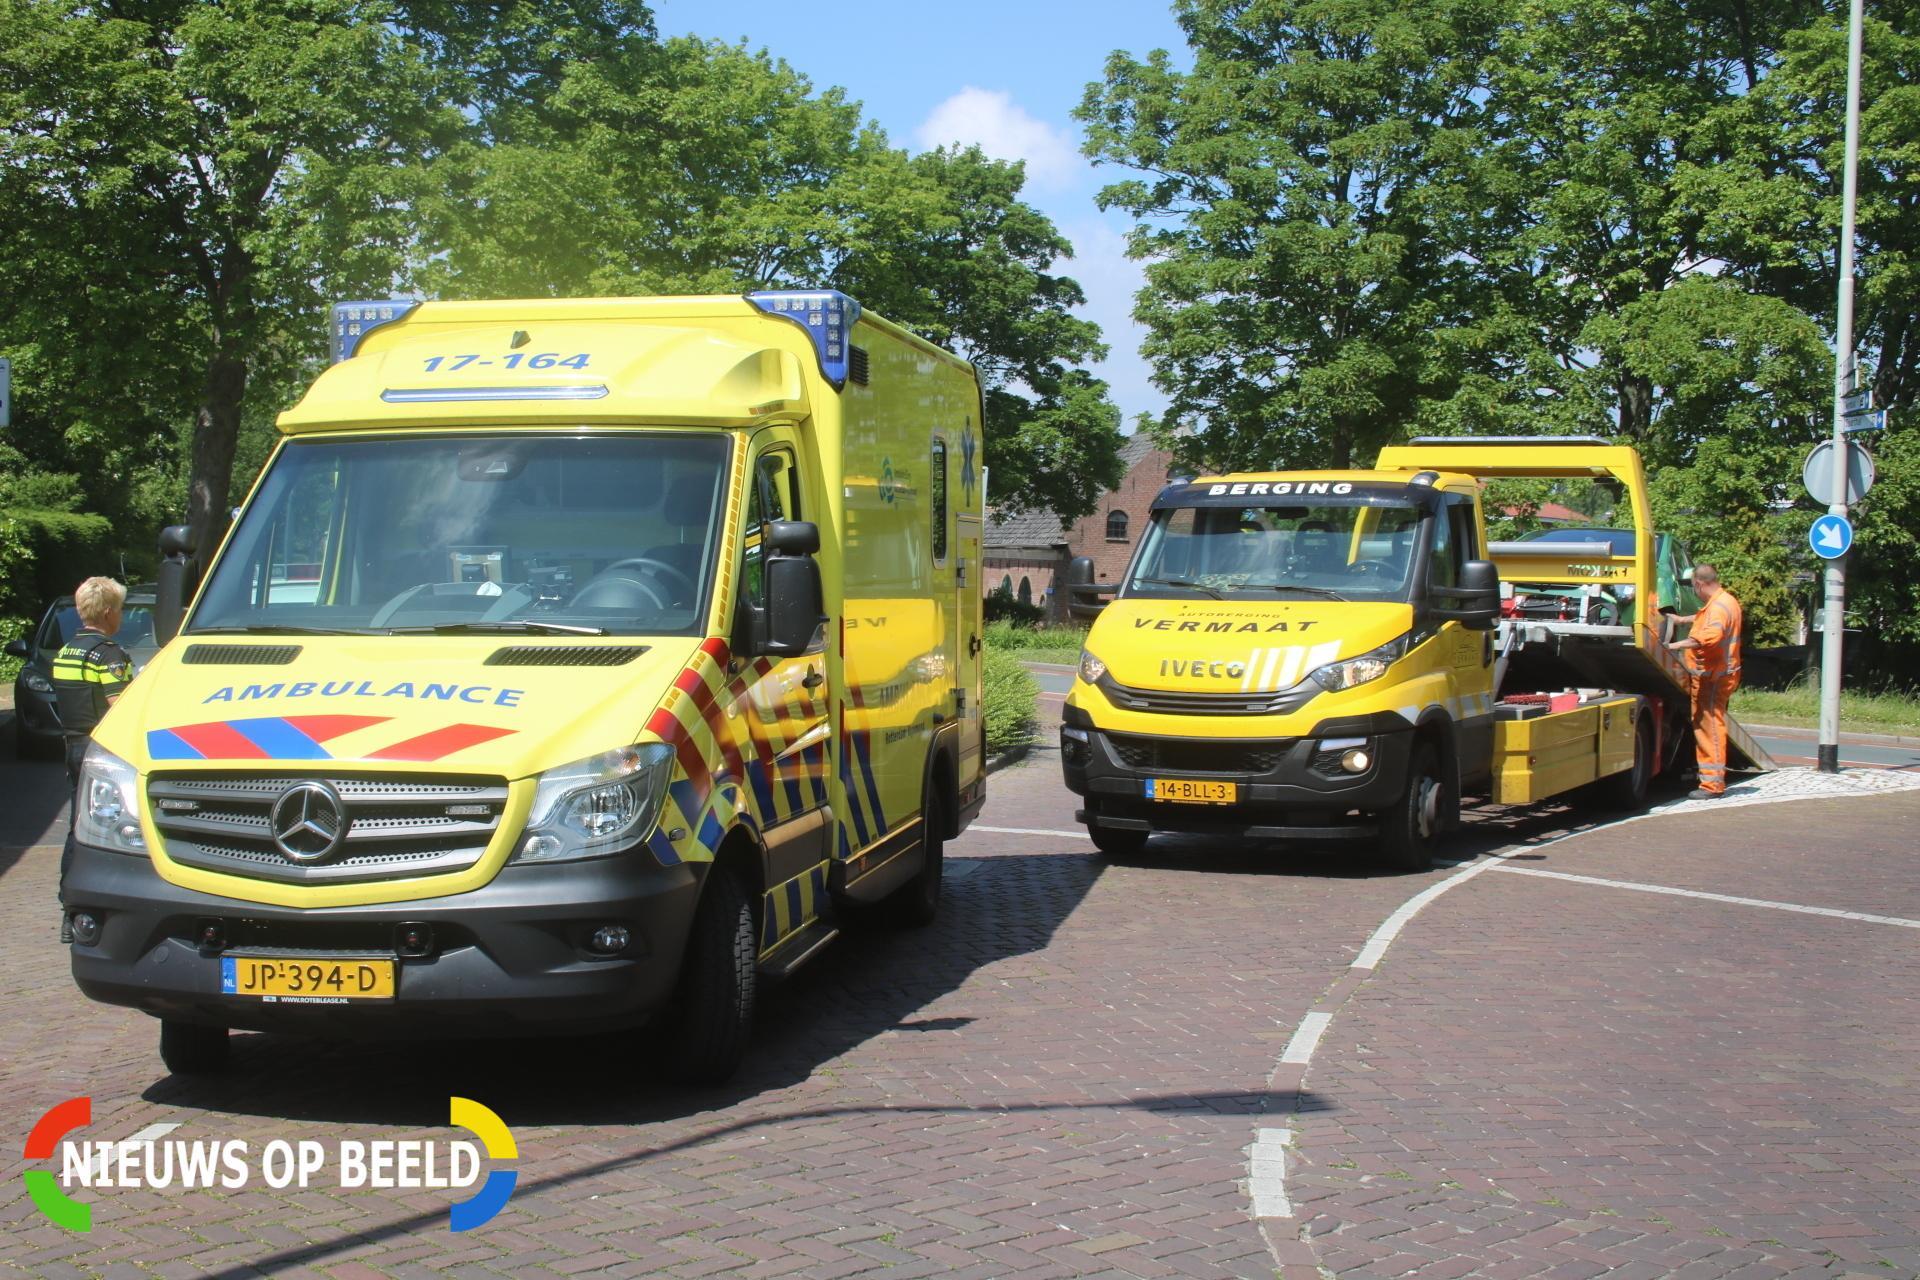 Automobilist knalt met auto hard tegen paal Stationsweg Zuidland